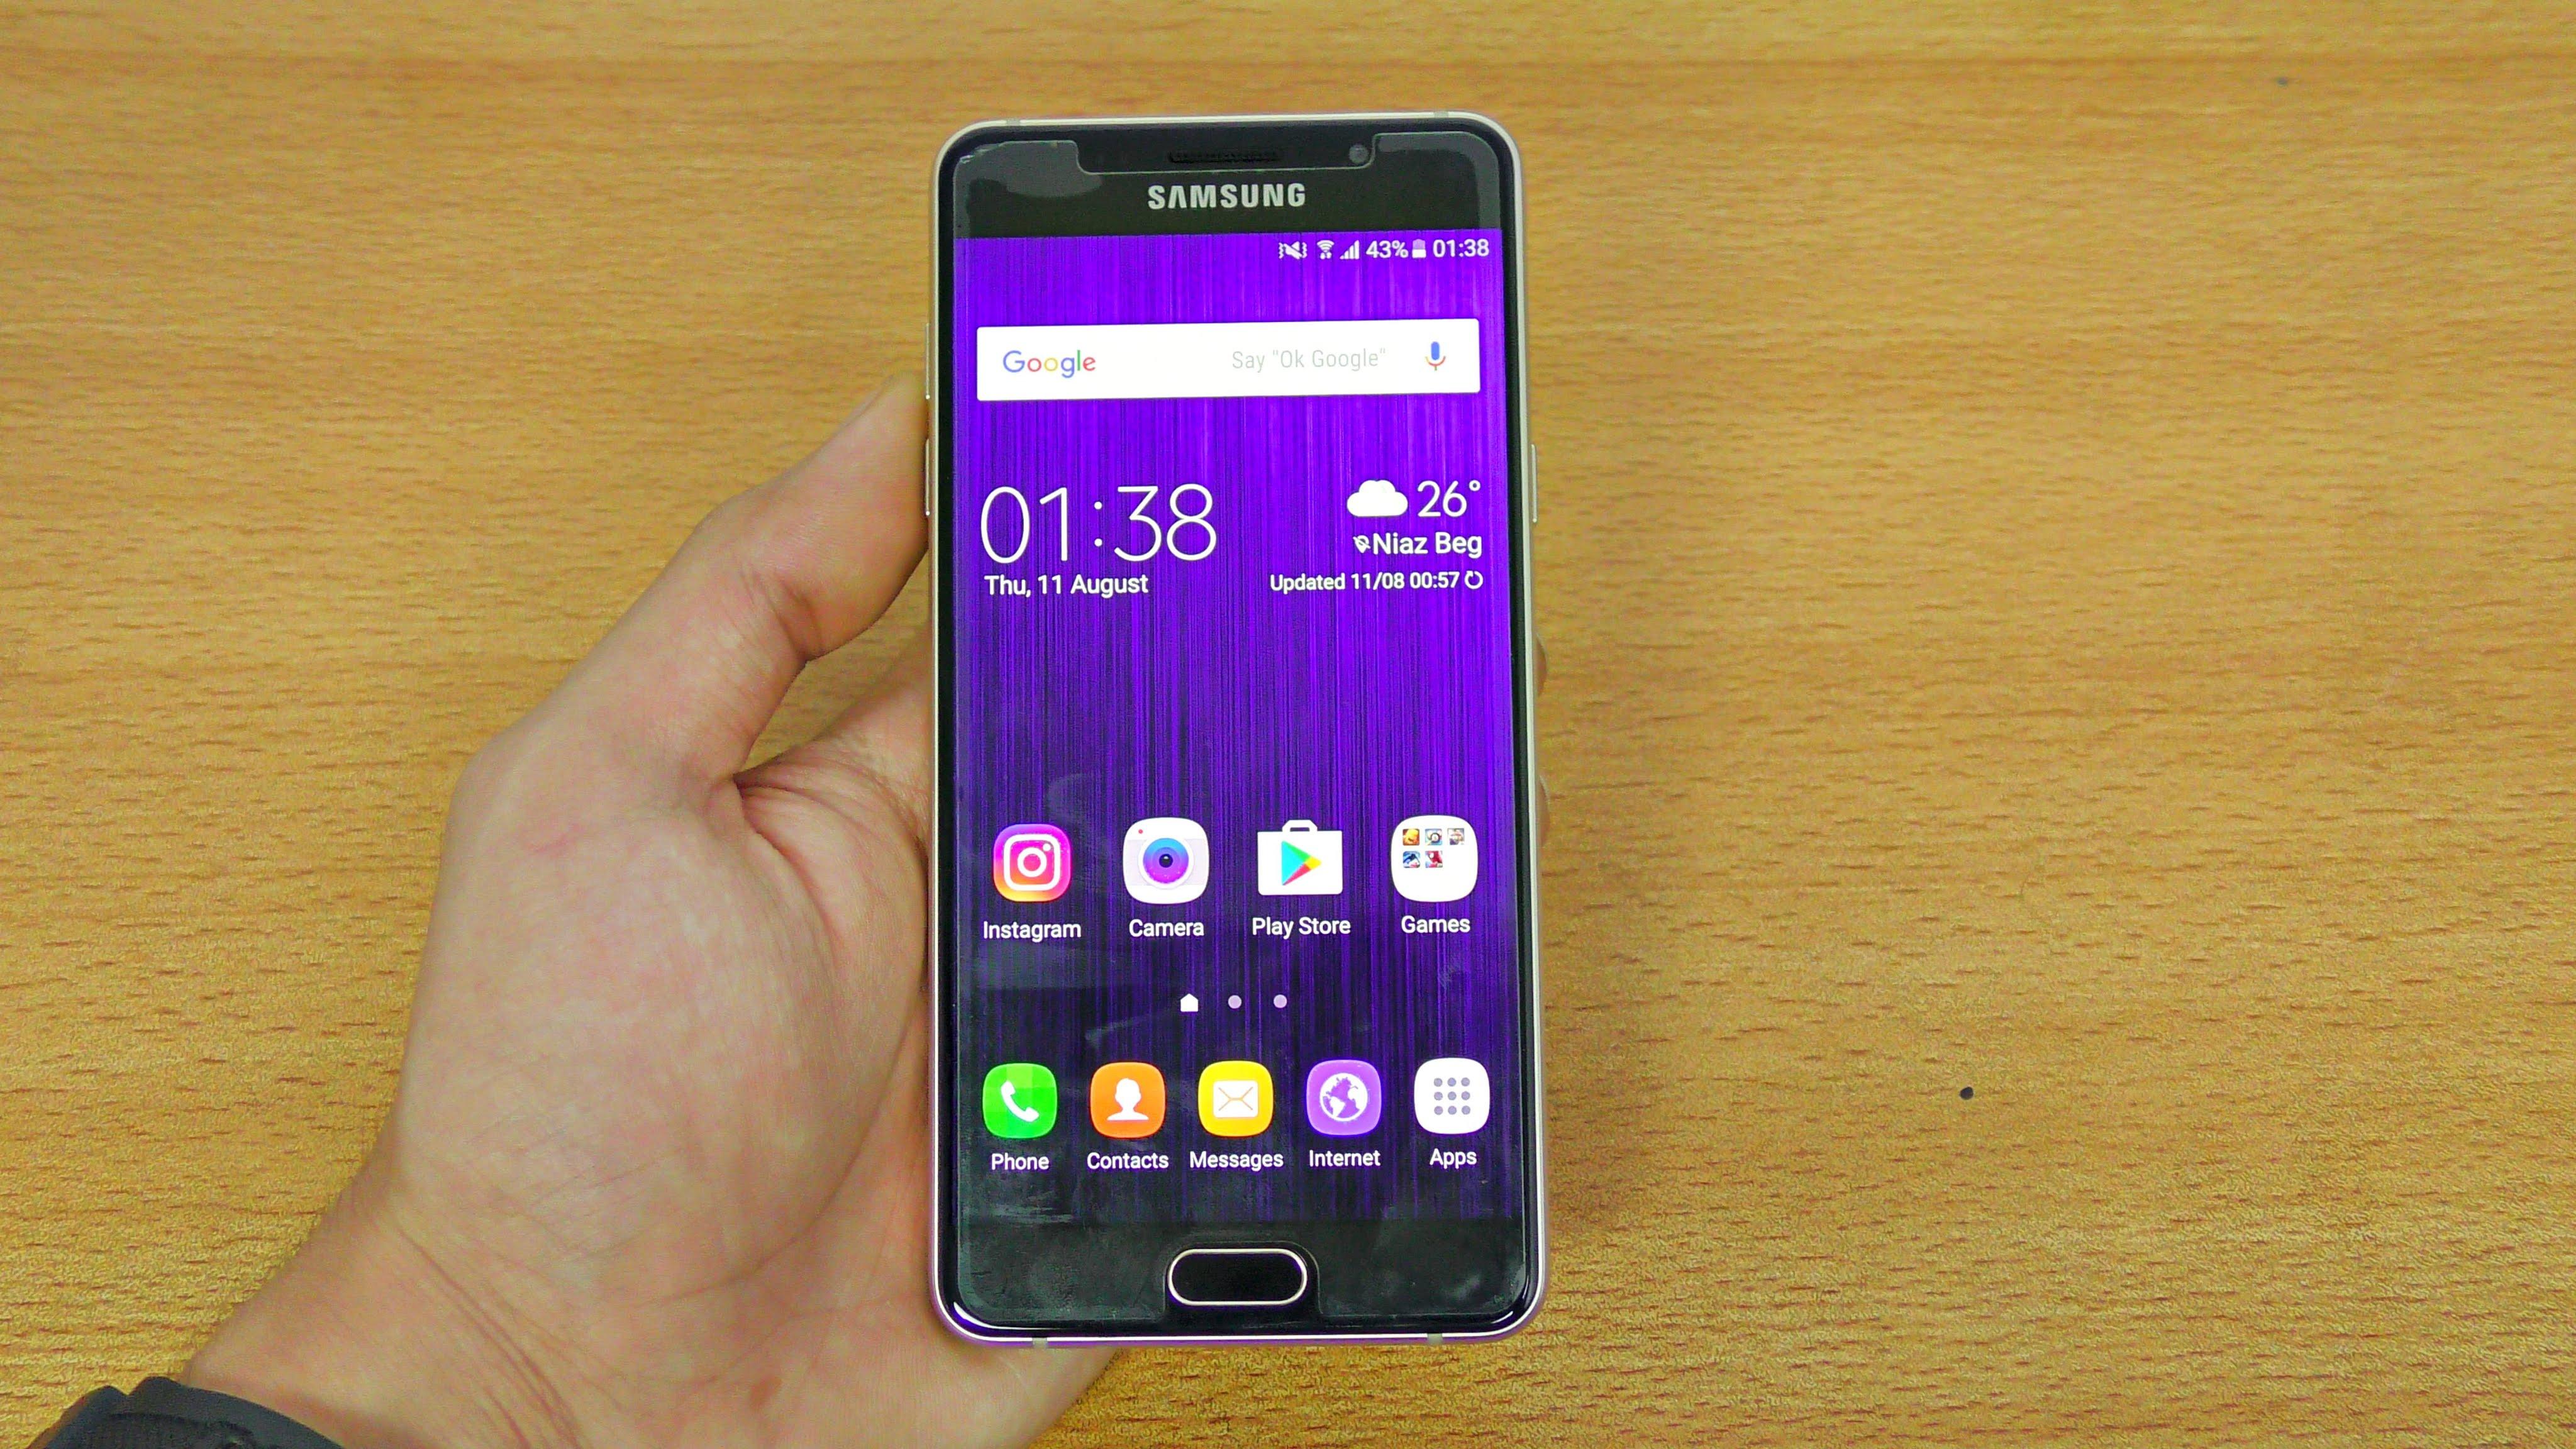 Install XXU4CQDK Android 7.0 Nougat On Galaxy A5 2016 SM-A510F 1